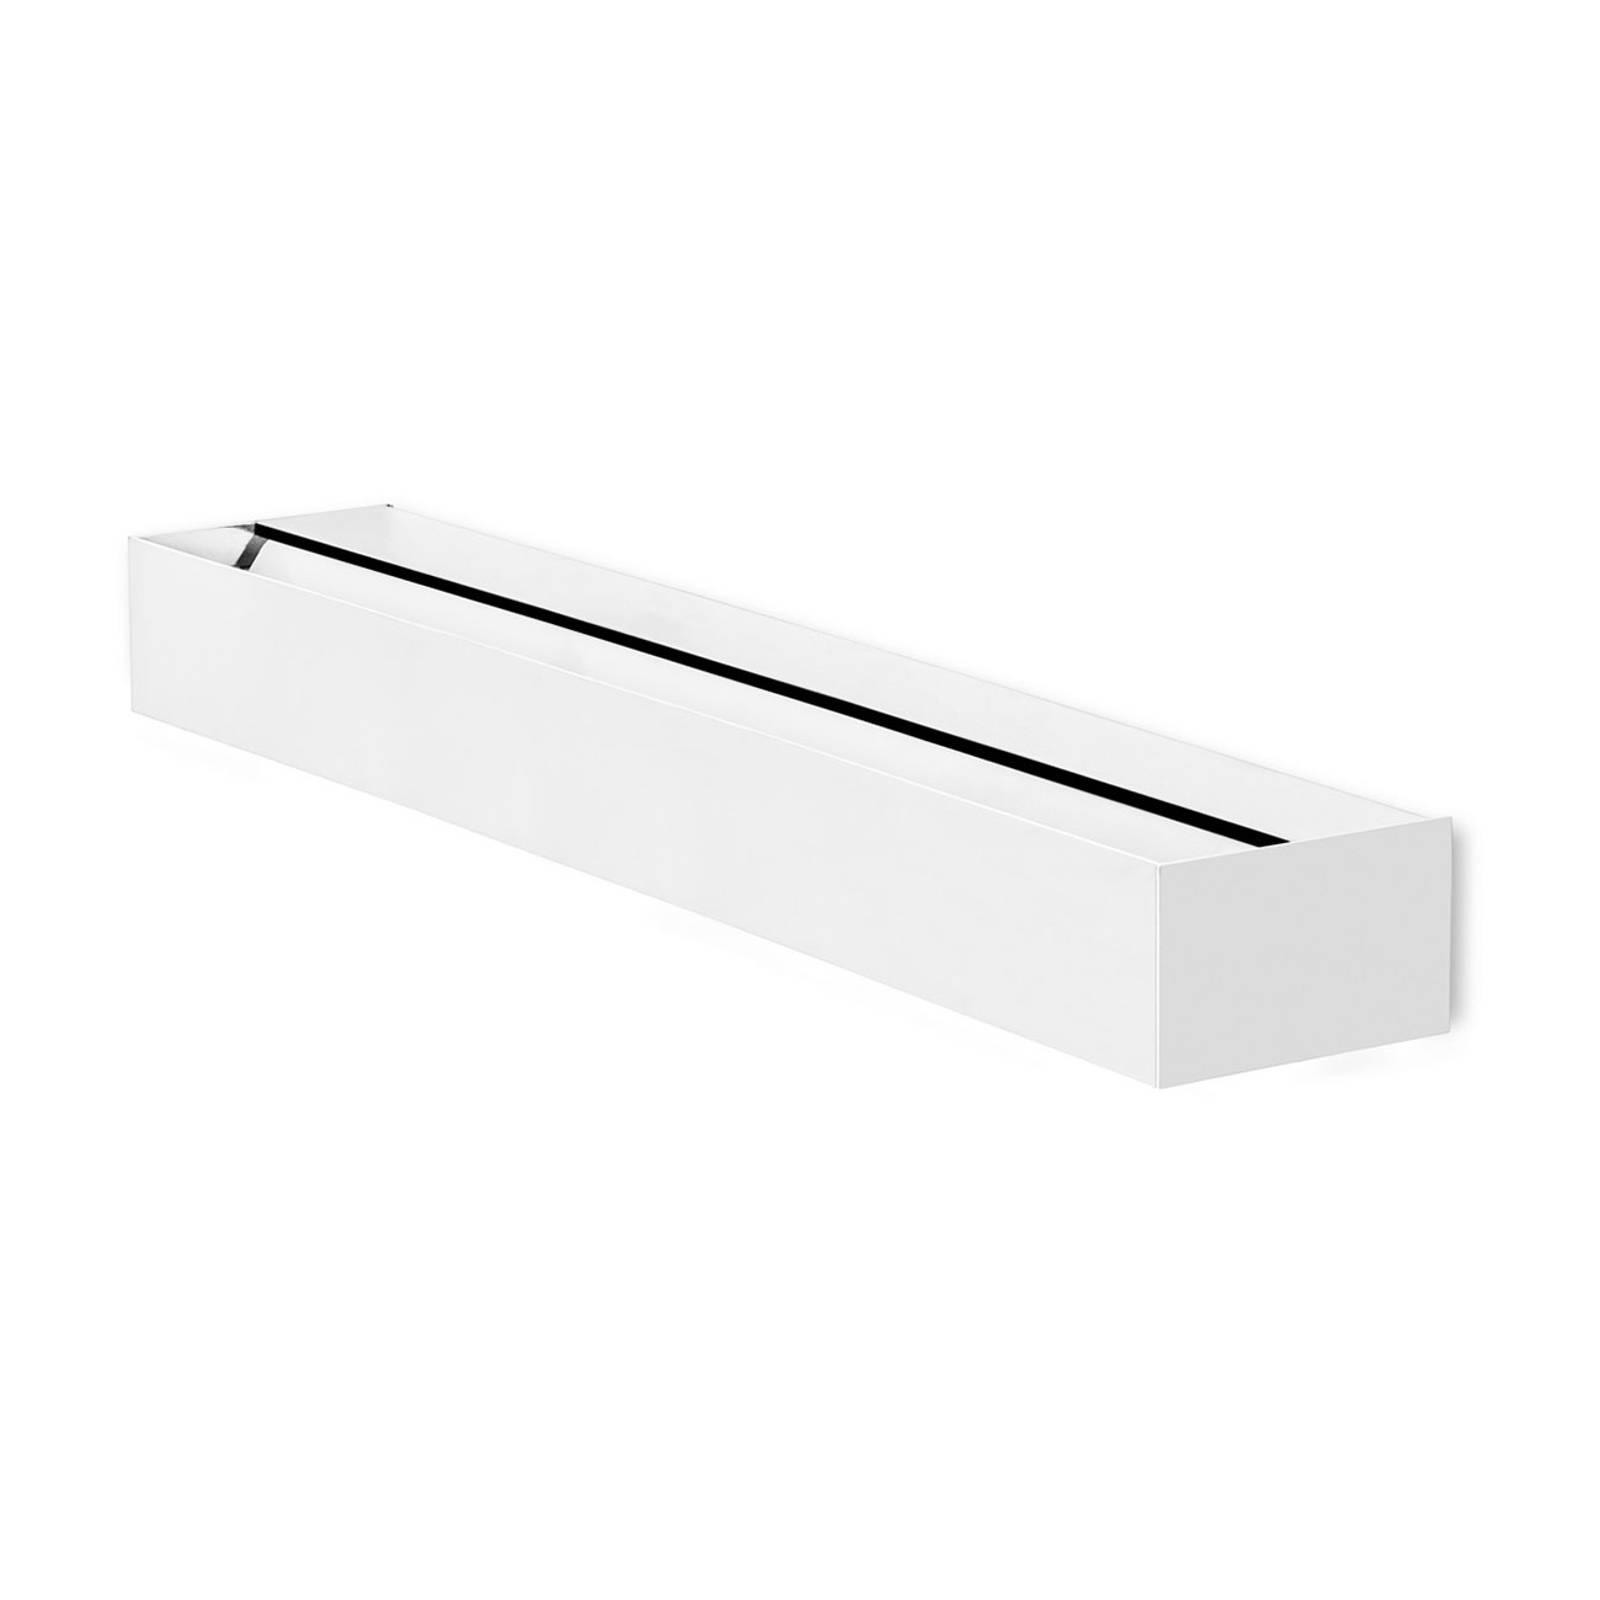 LEDS-C4 Lia LED wandlamp, mat wit 60 cm